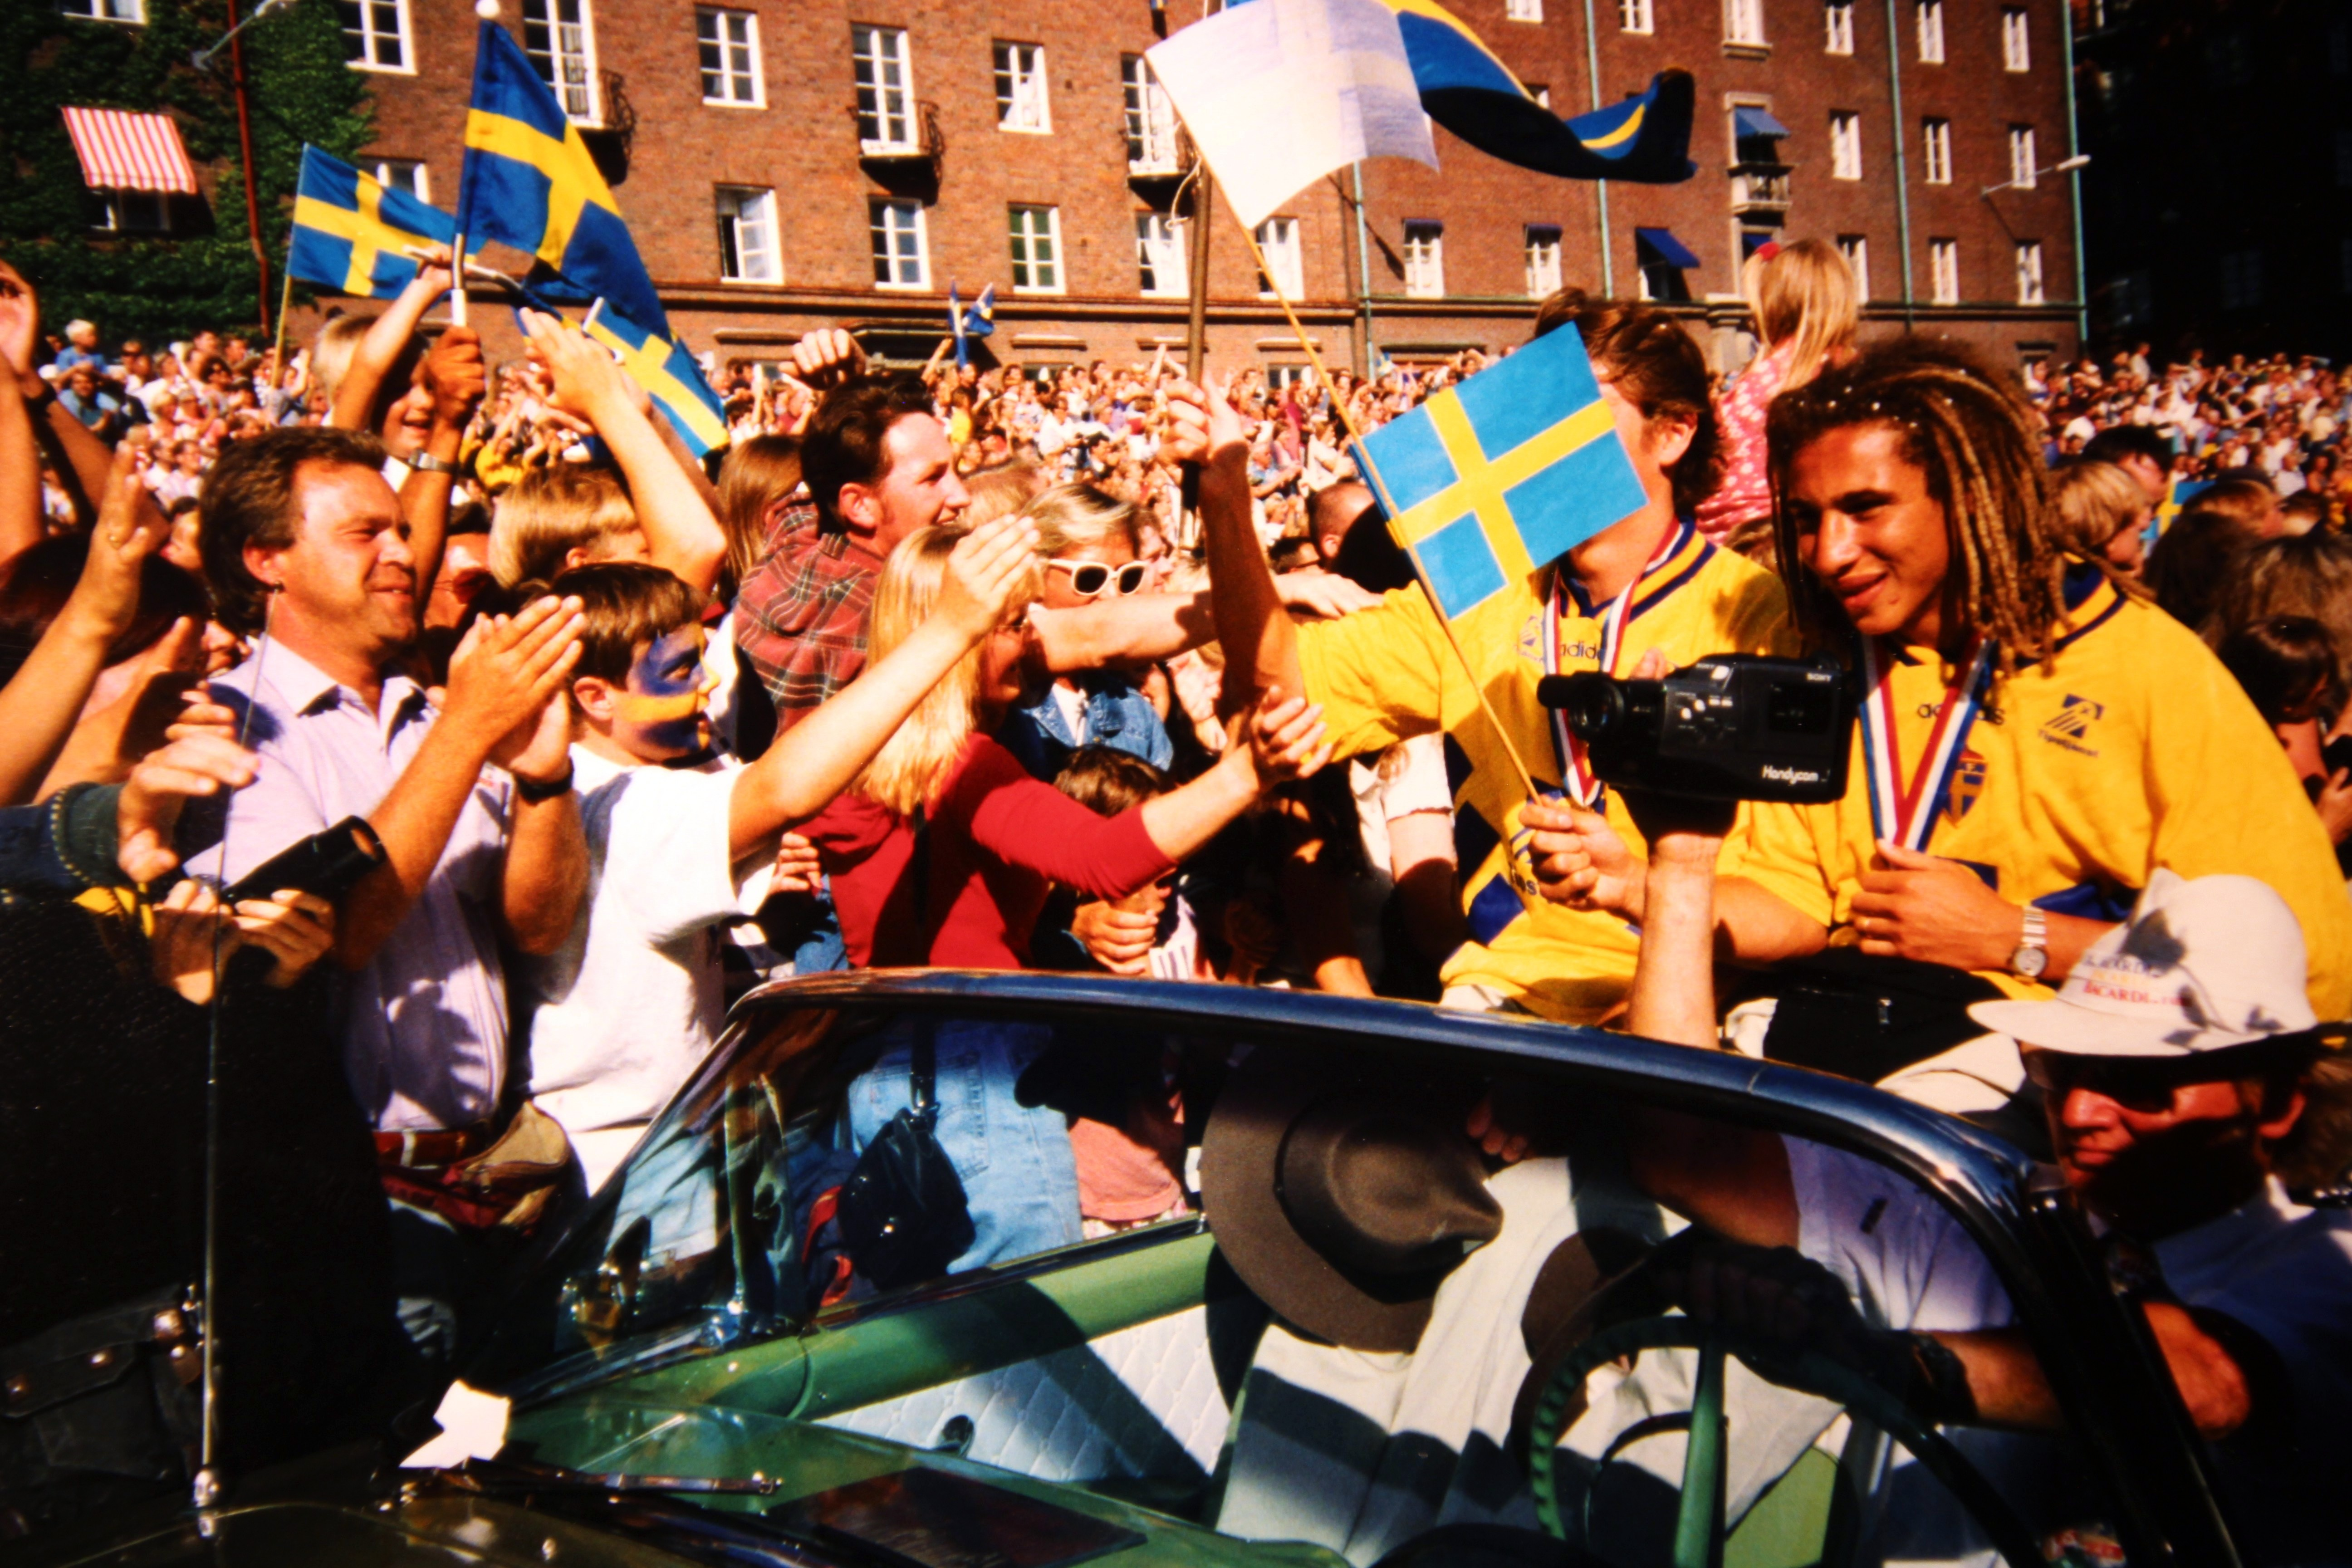 File:Football players Pontus Kåmark Henrik Larsson, July 18, 1994.jpg